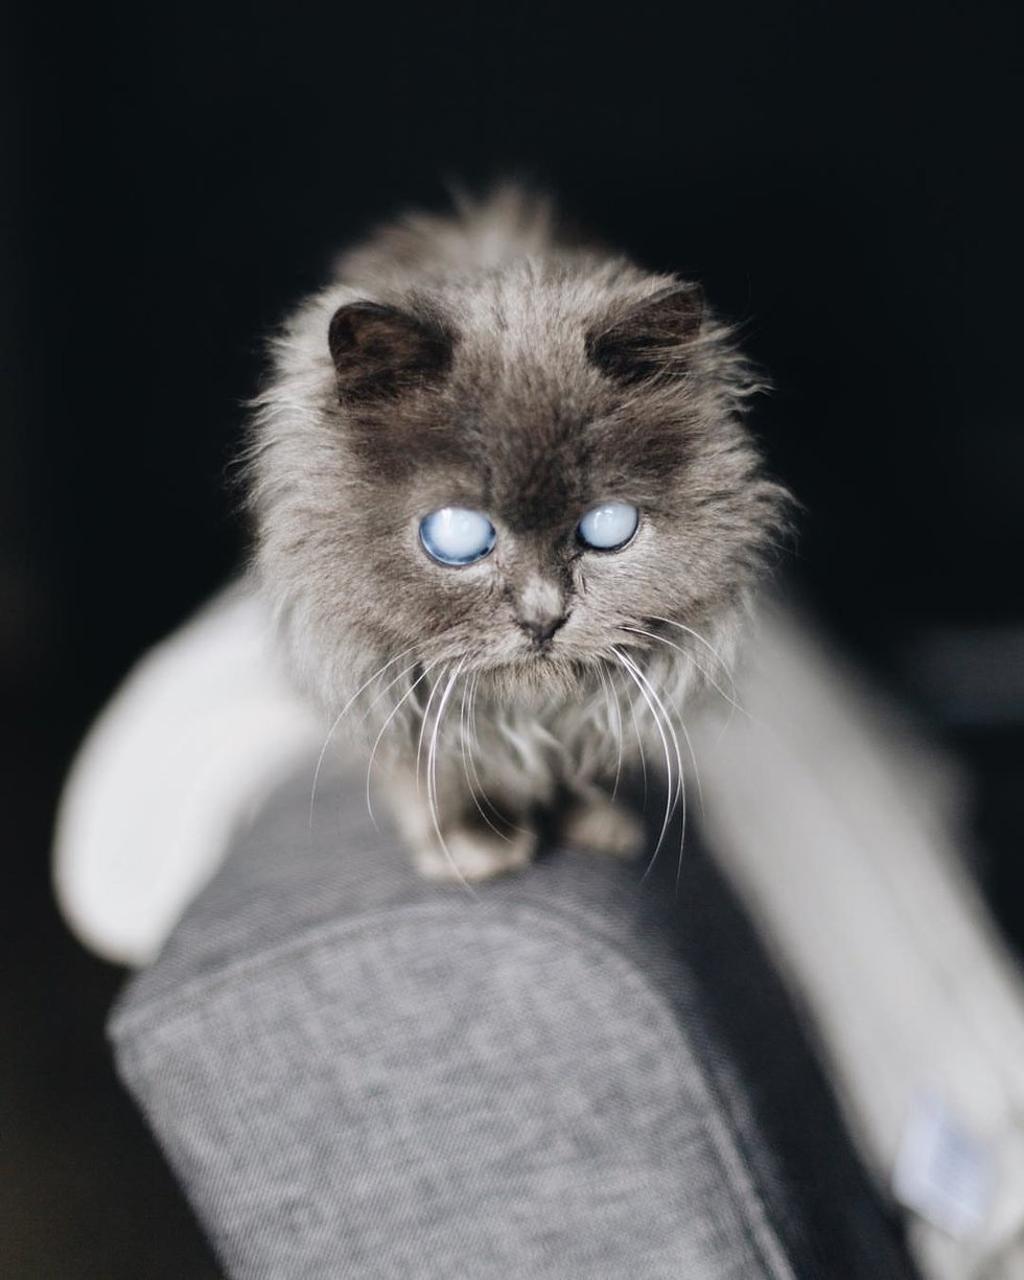 gattino con occhi bianchi